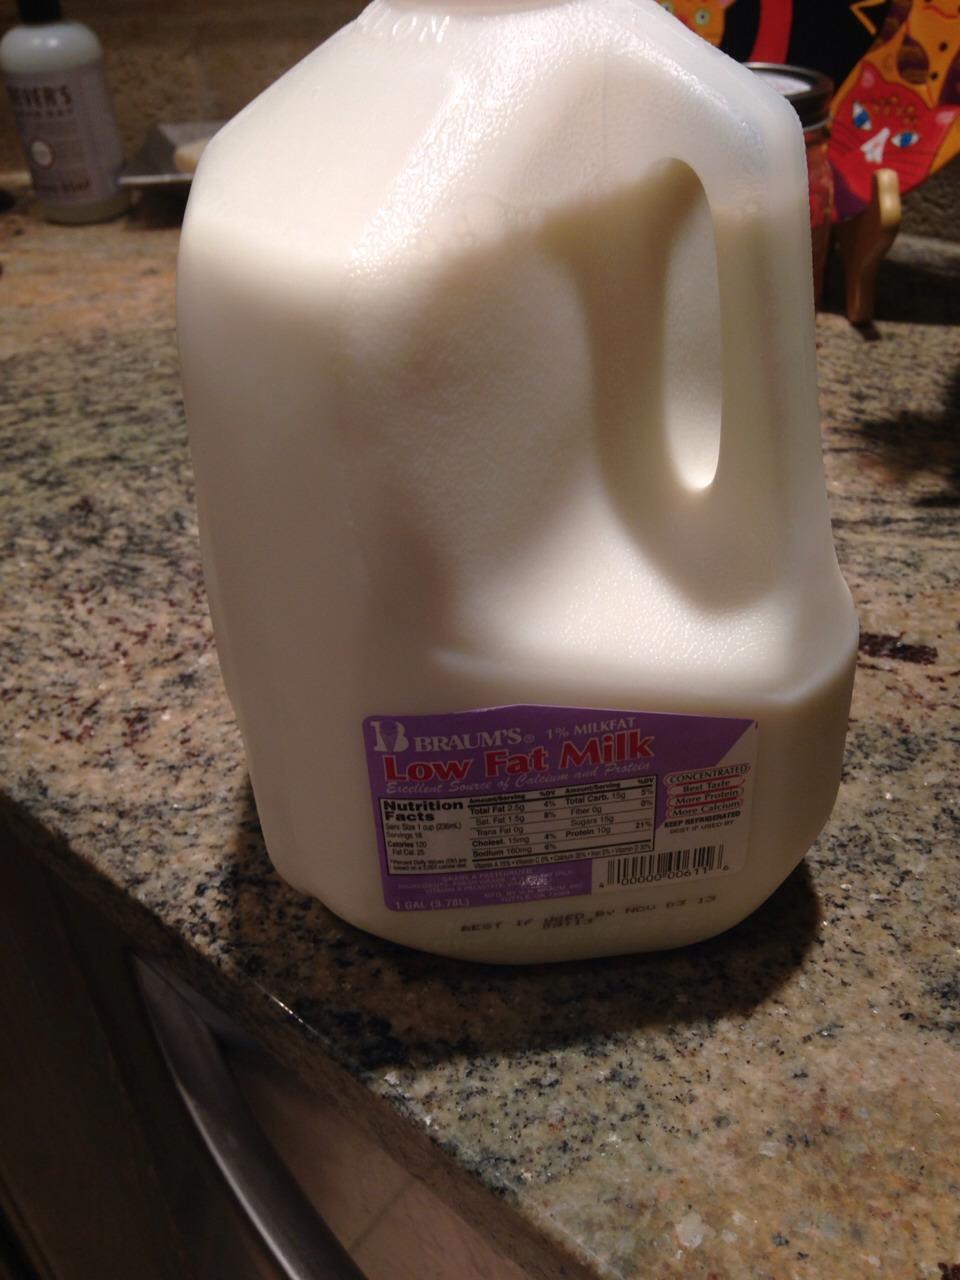 Milk is optional